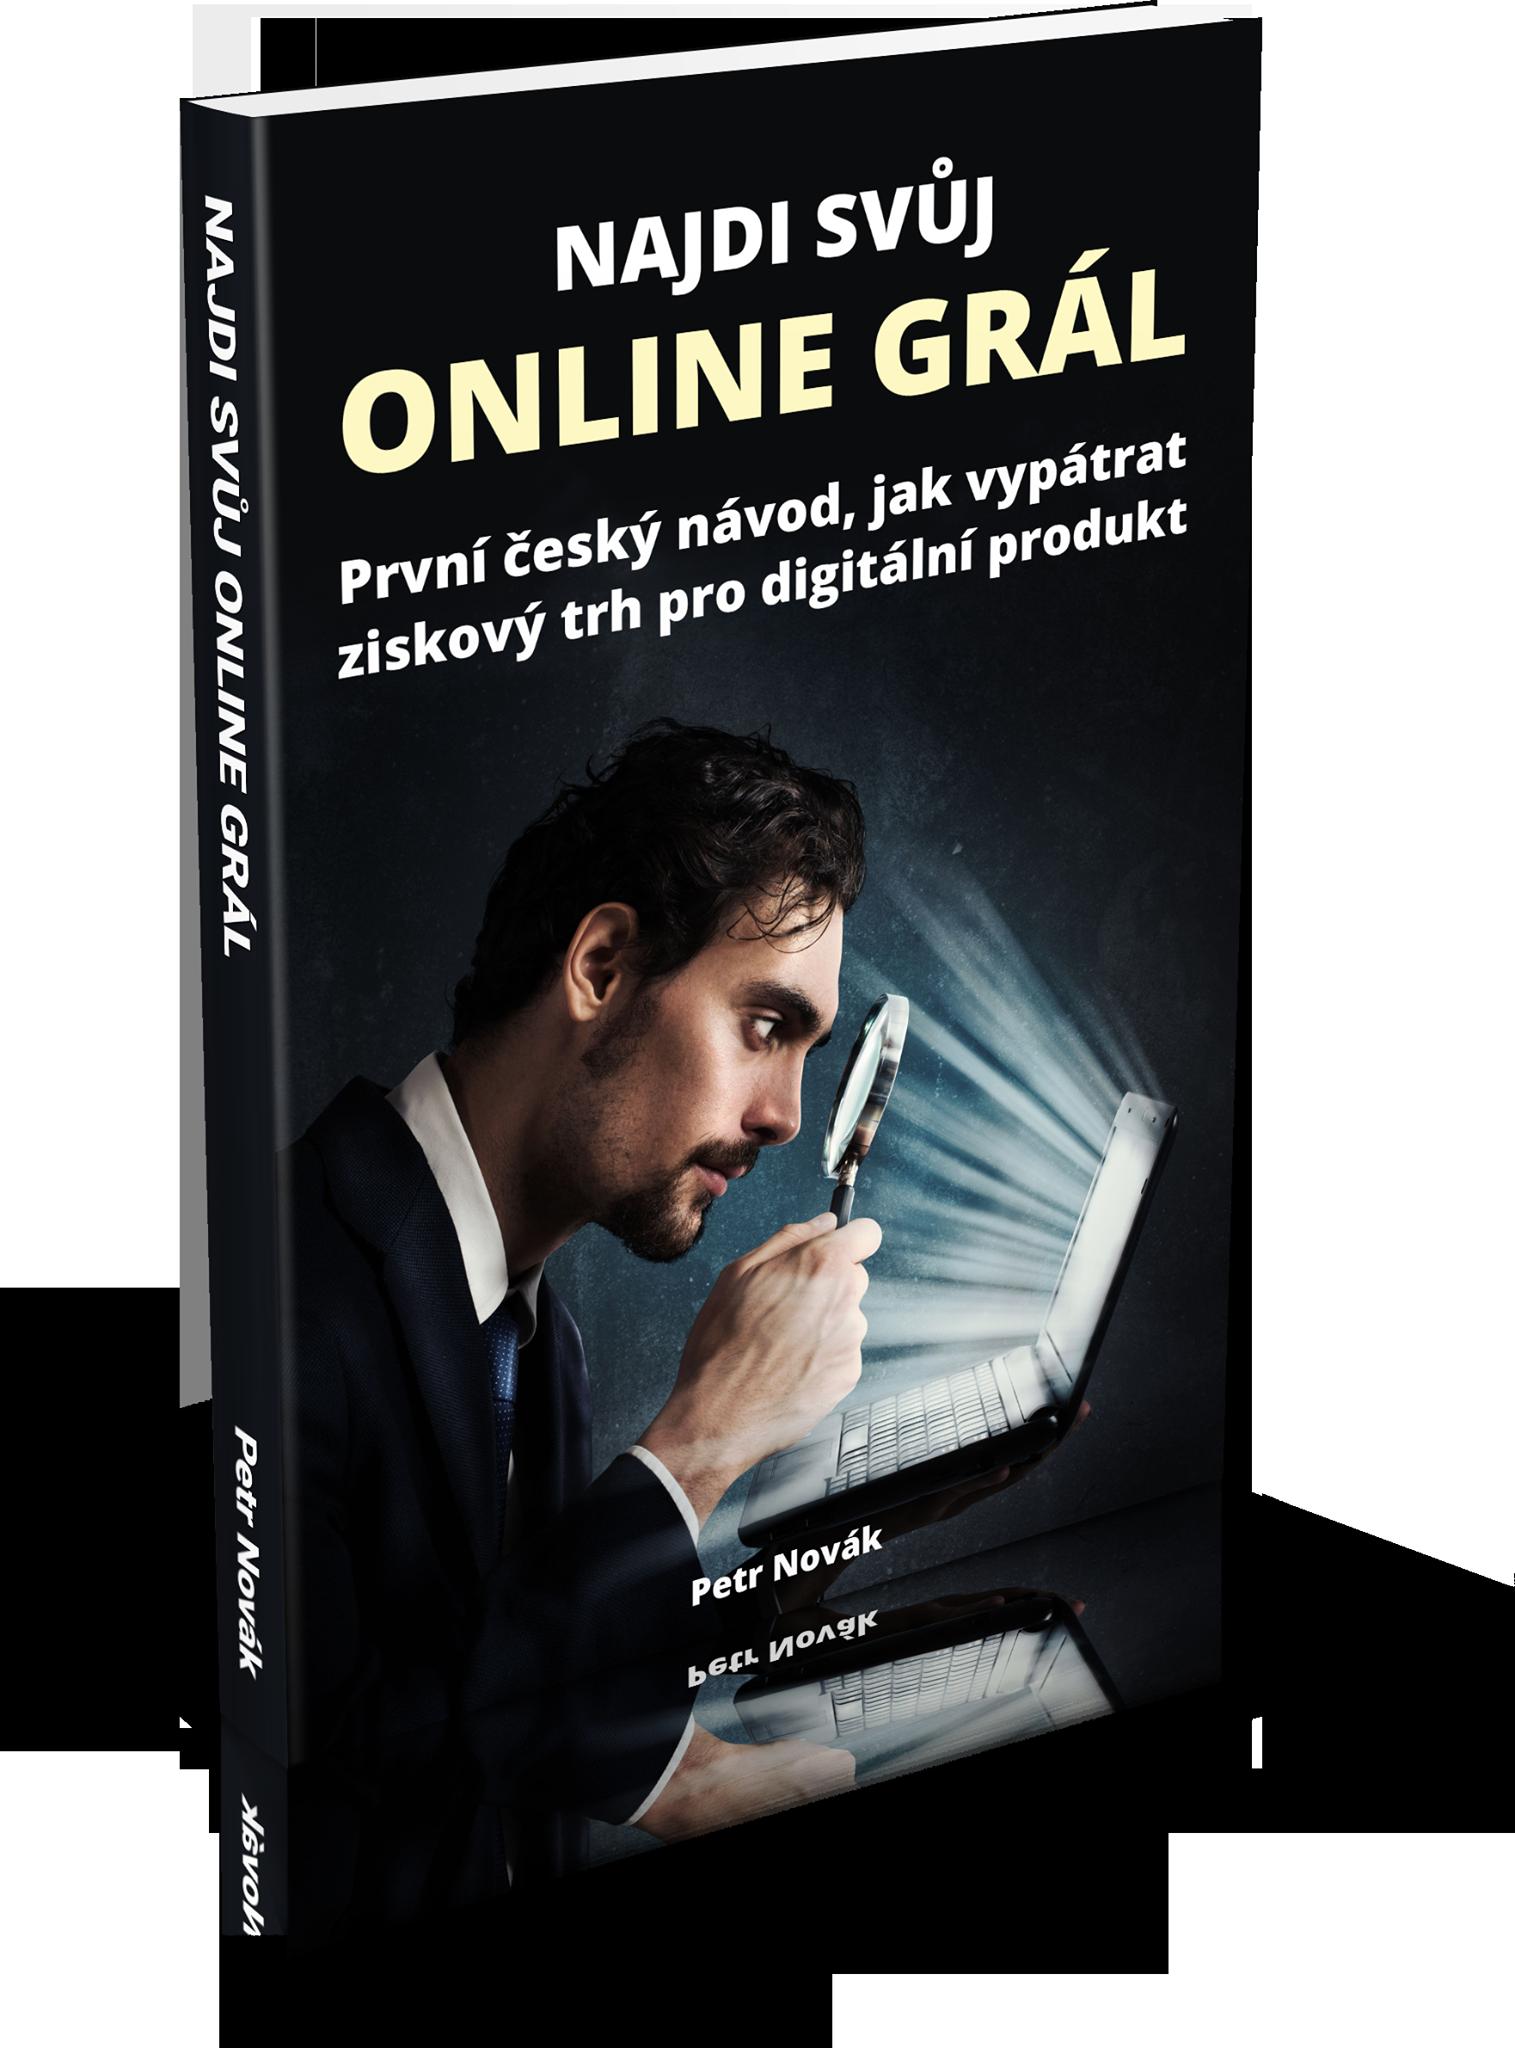 Online grál kniha